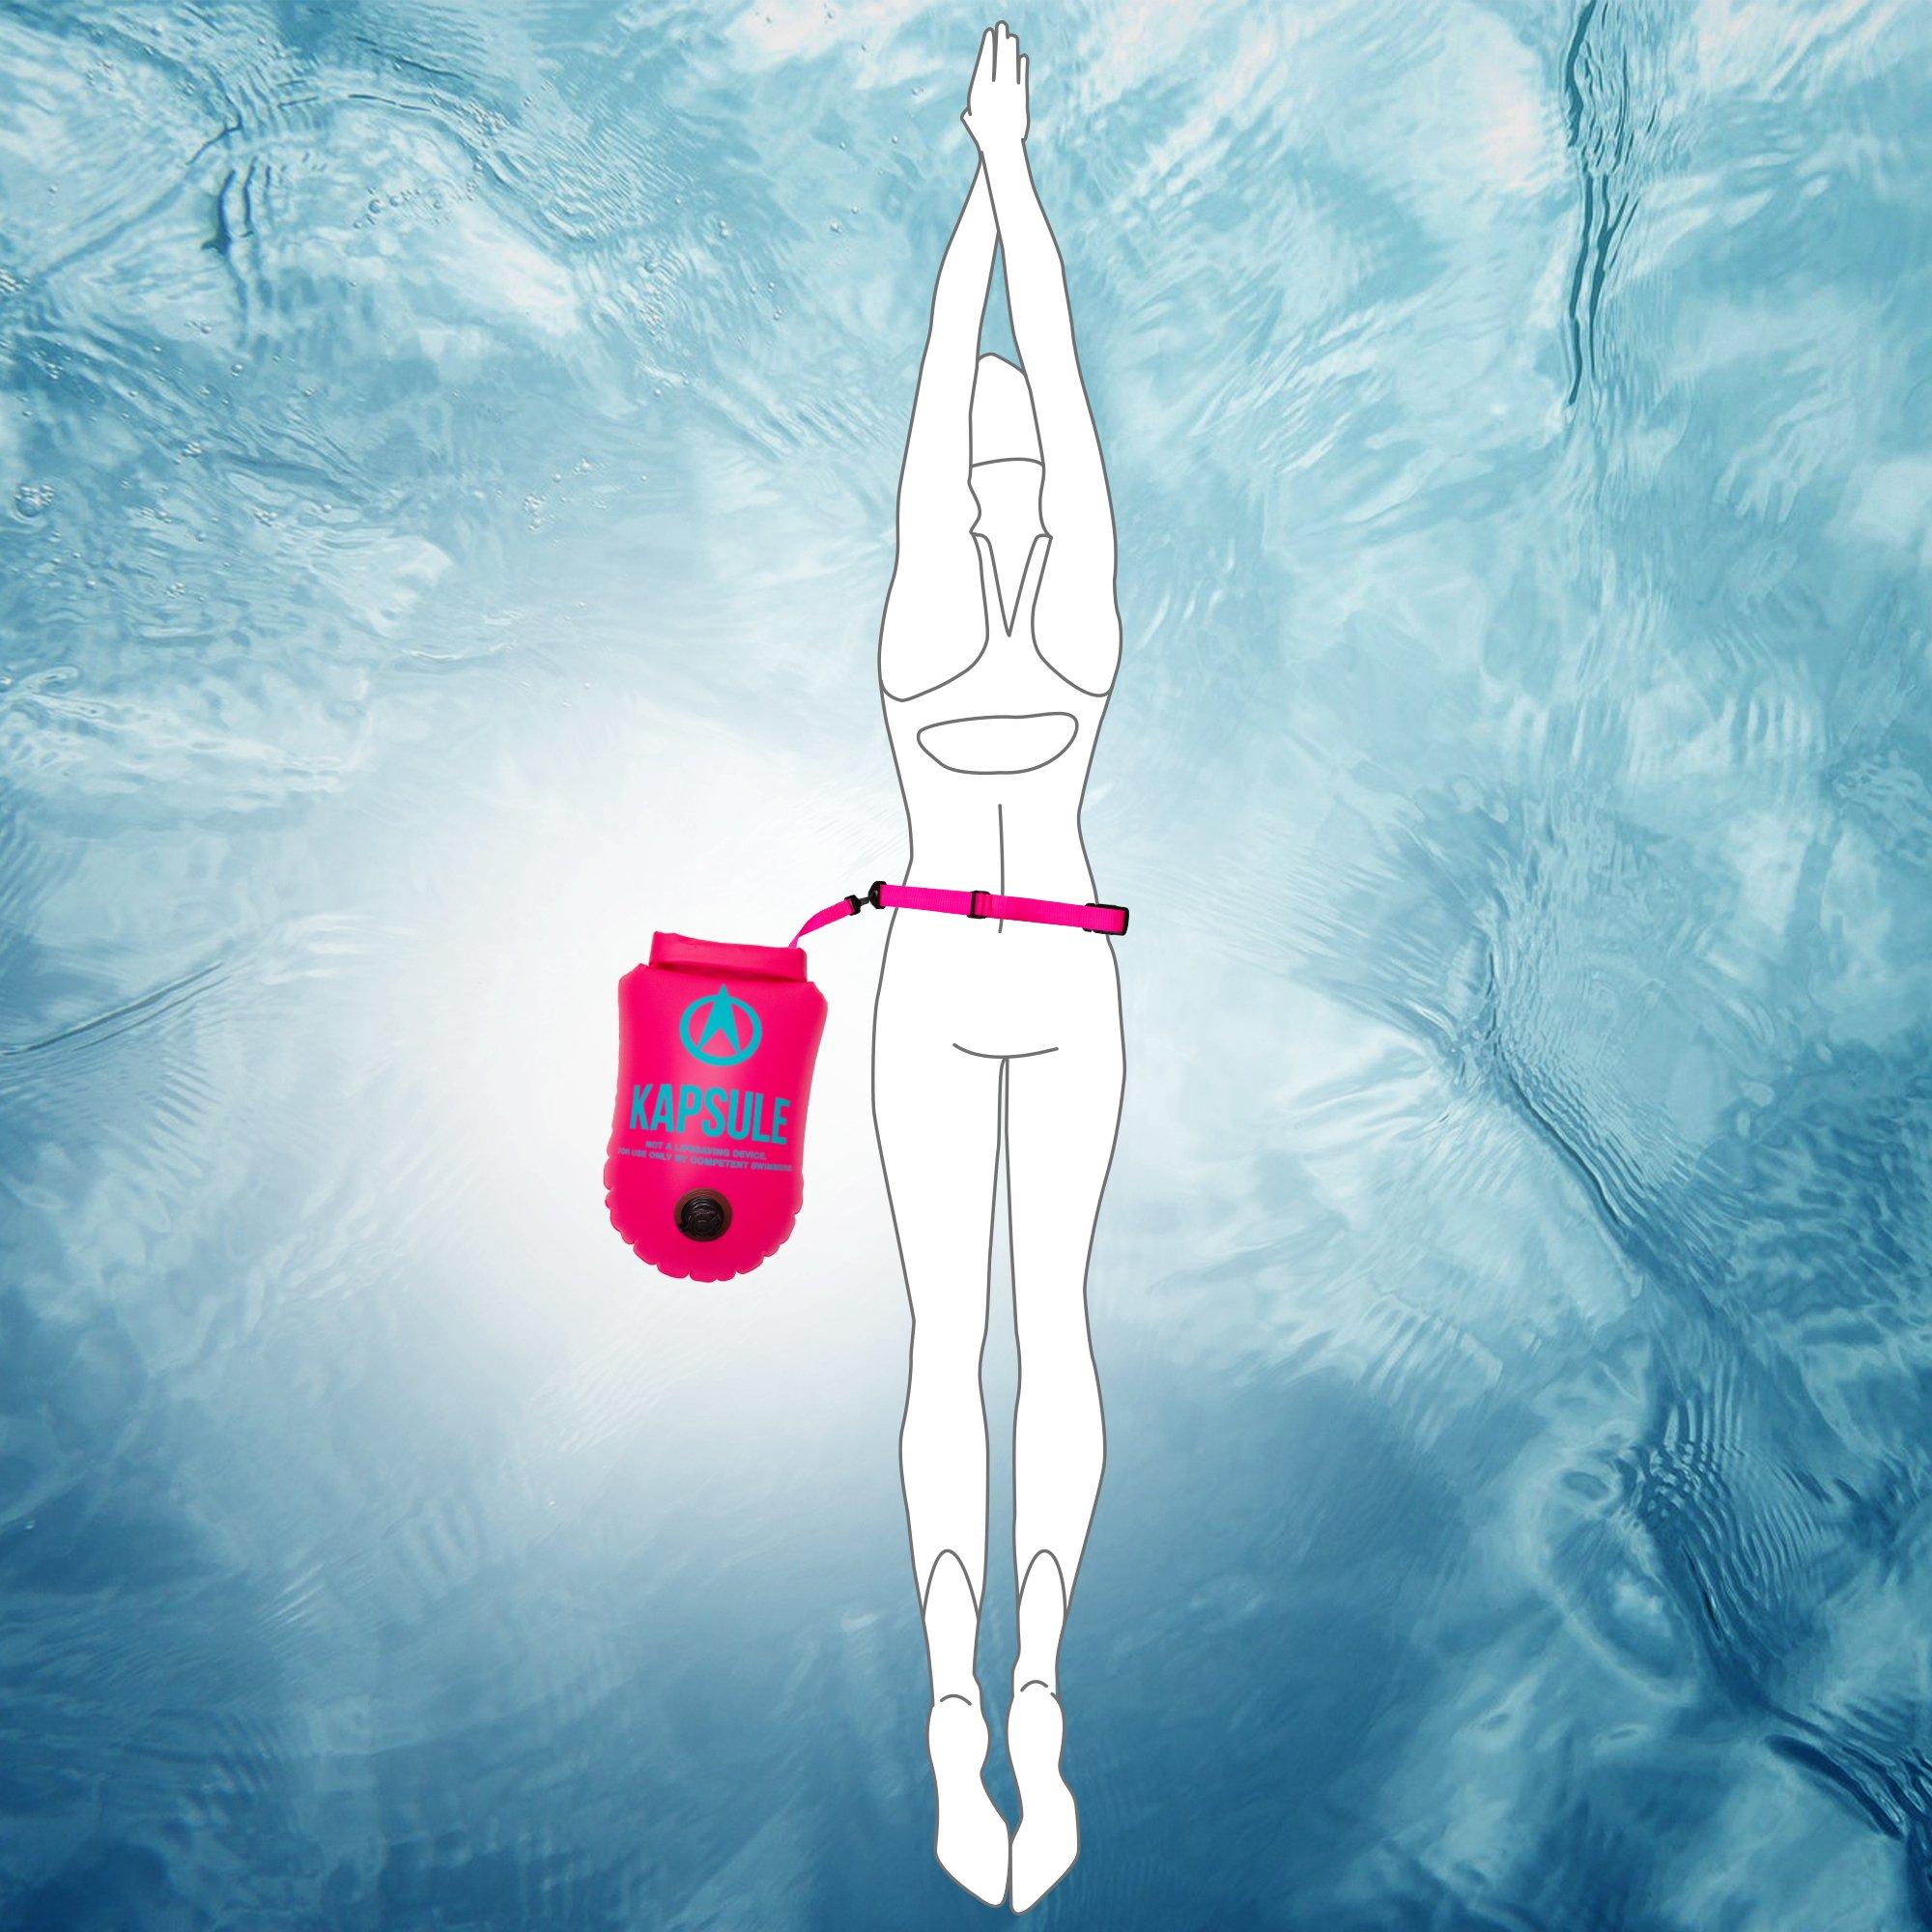 KAPSULE Swim Buoy (NEON 20L Orange) - Personal Swimming Float and Dry Bag by KAPSULE (Image #5)